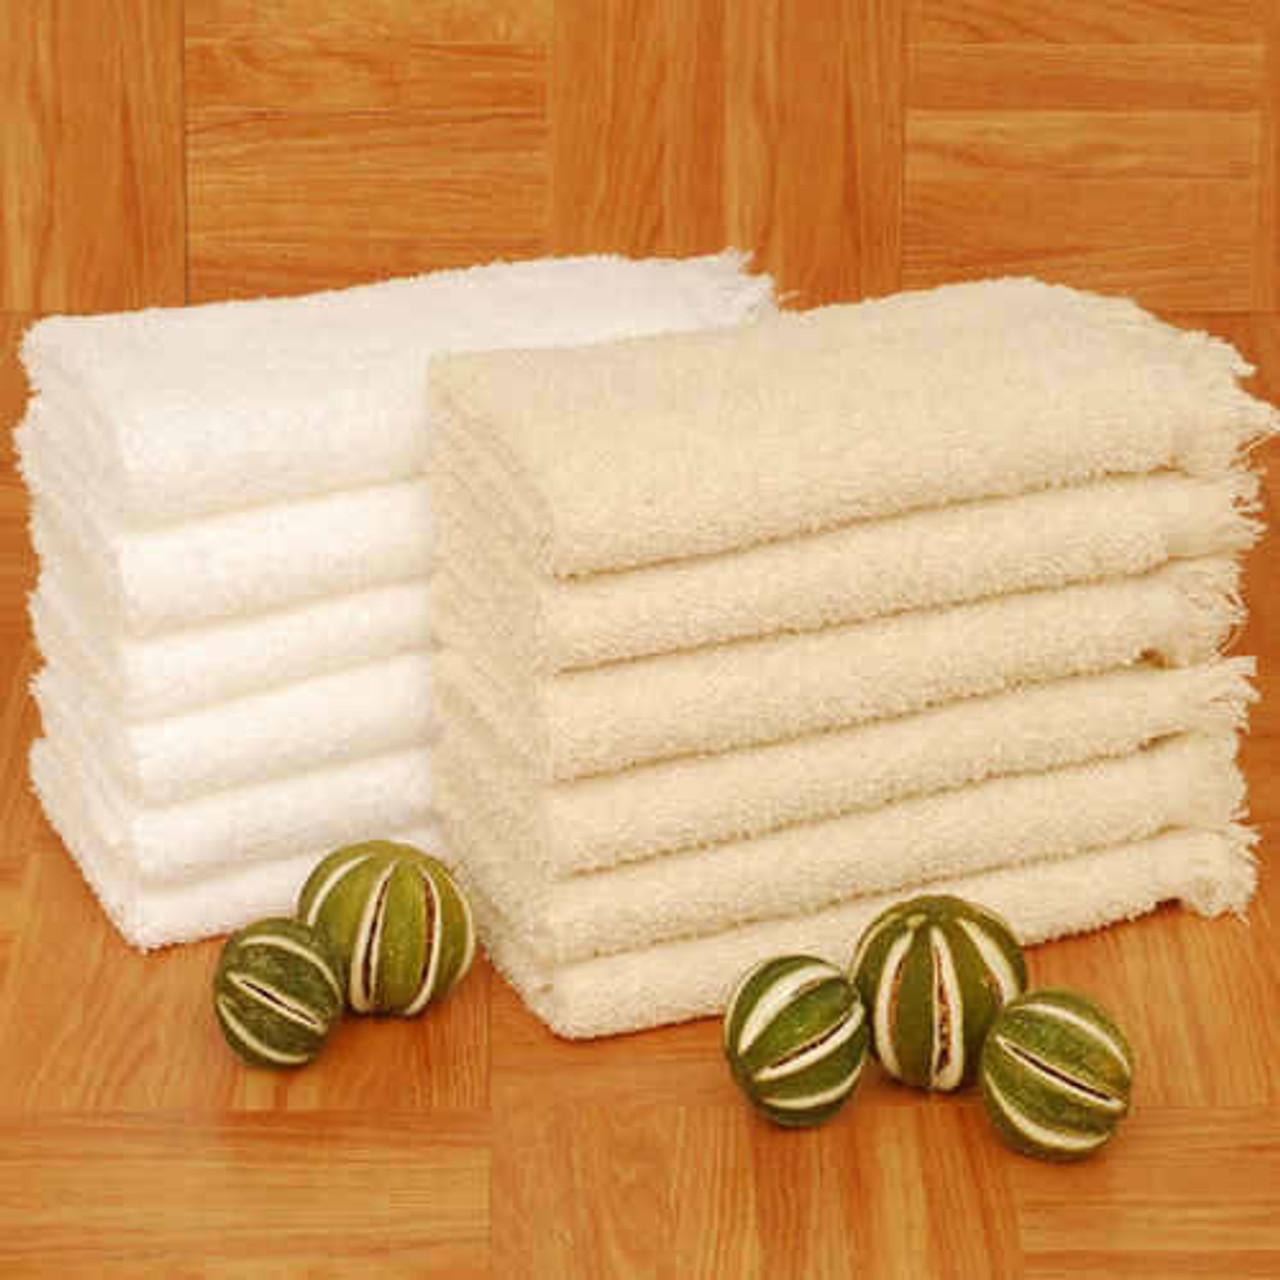 1888 Mills 1888 Mills Wholesale or Golf / Fingertip Towels in Bulk